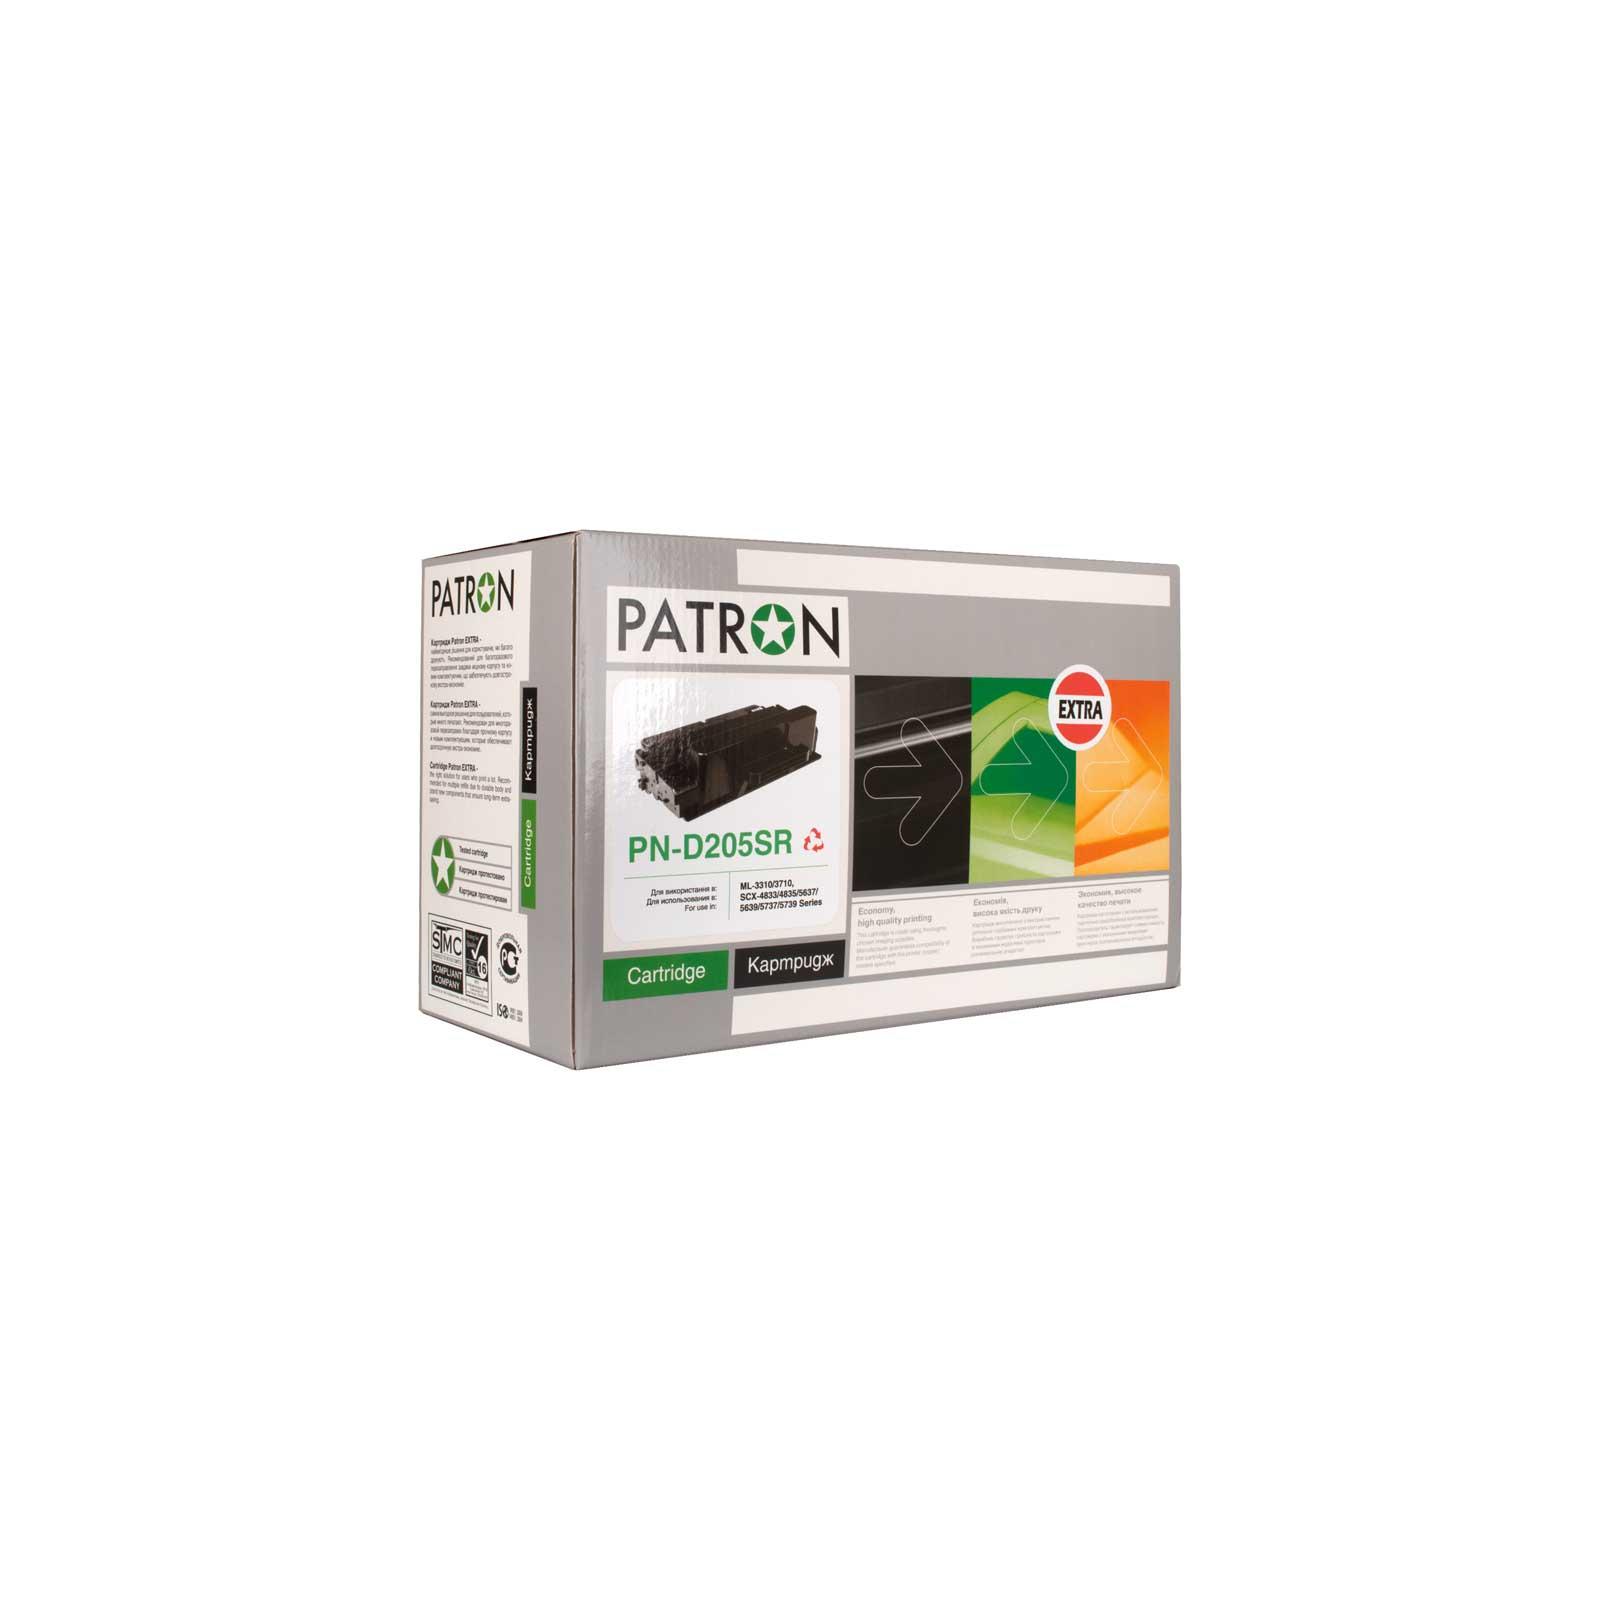 Картридж PATRON SAMSUNG SCX-4833/5637, ML-3310/3710 Extra (PN-D205SR)